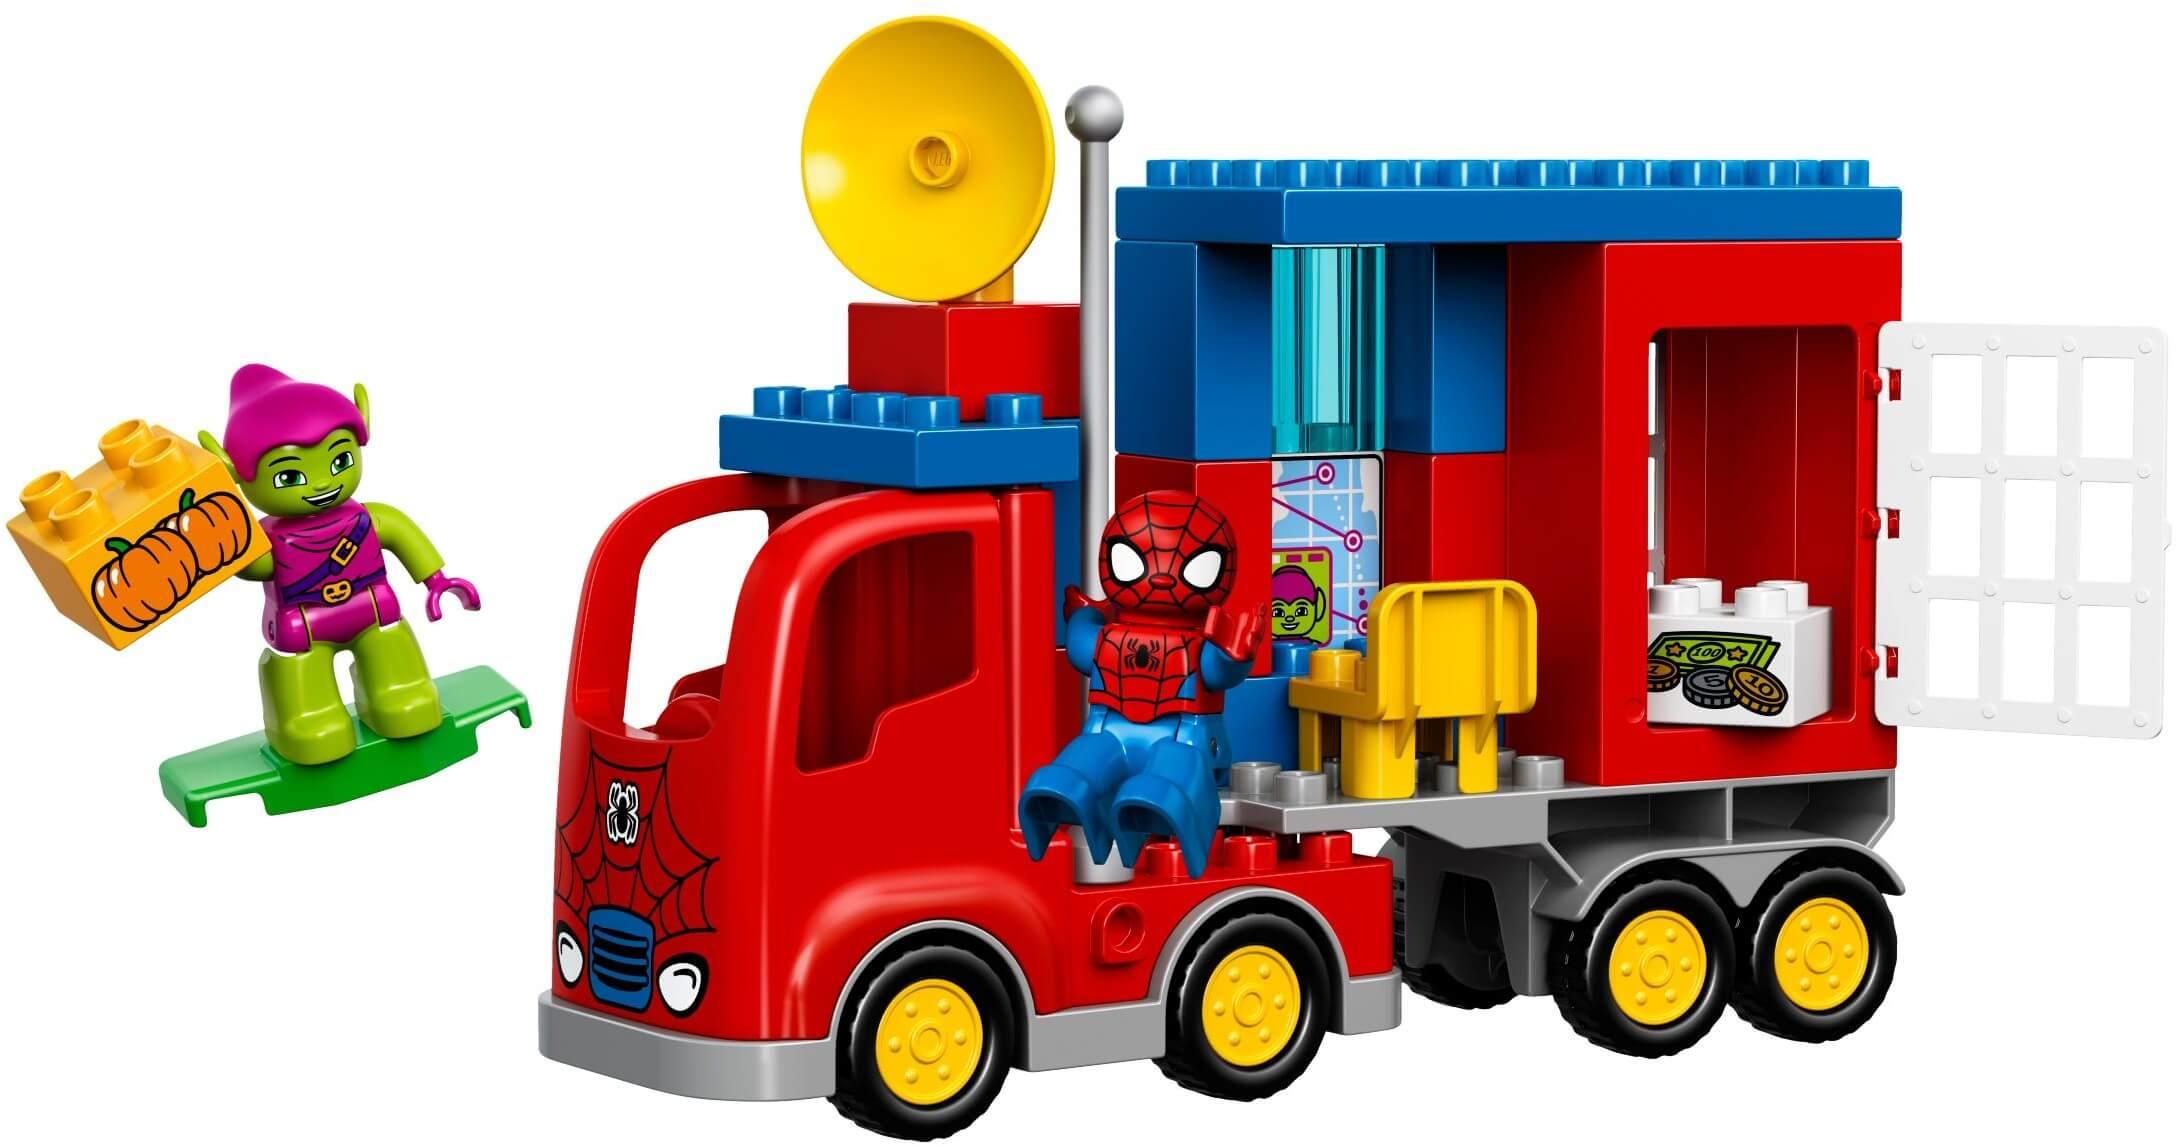 Mua đồ chơi LEGO 10608 - LEGO DUPLO 10608 - Xe Tải Spider Truck của Người Nhện (LEGO DUPLO Spider-Man Spider Truck Adventure 10608)